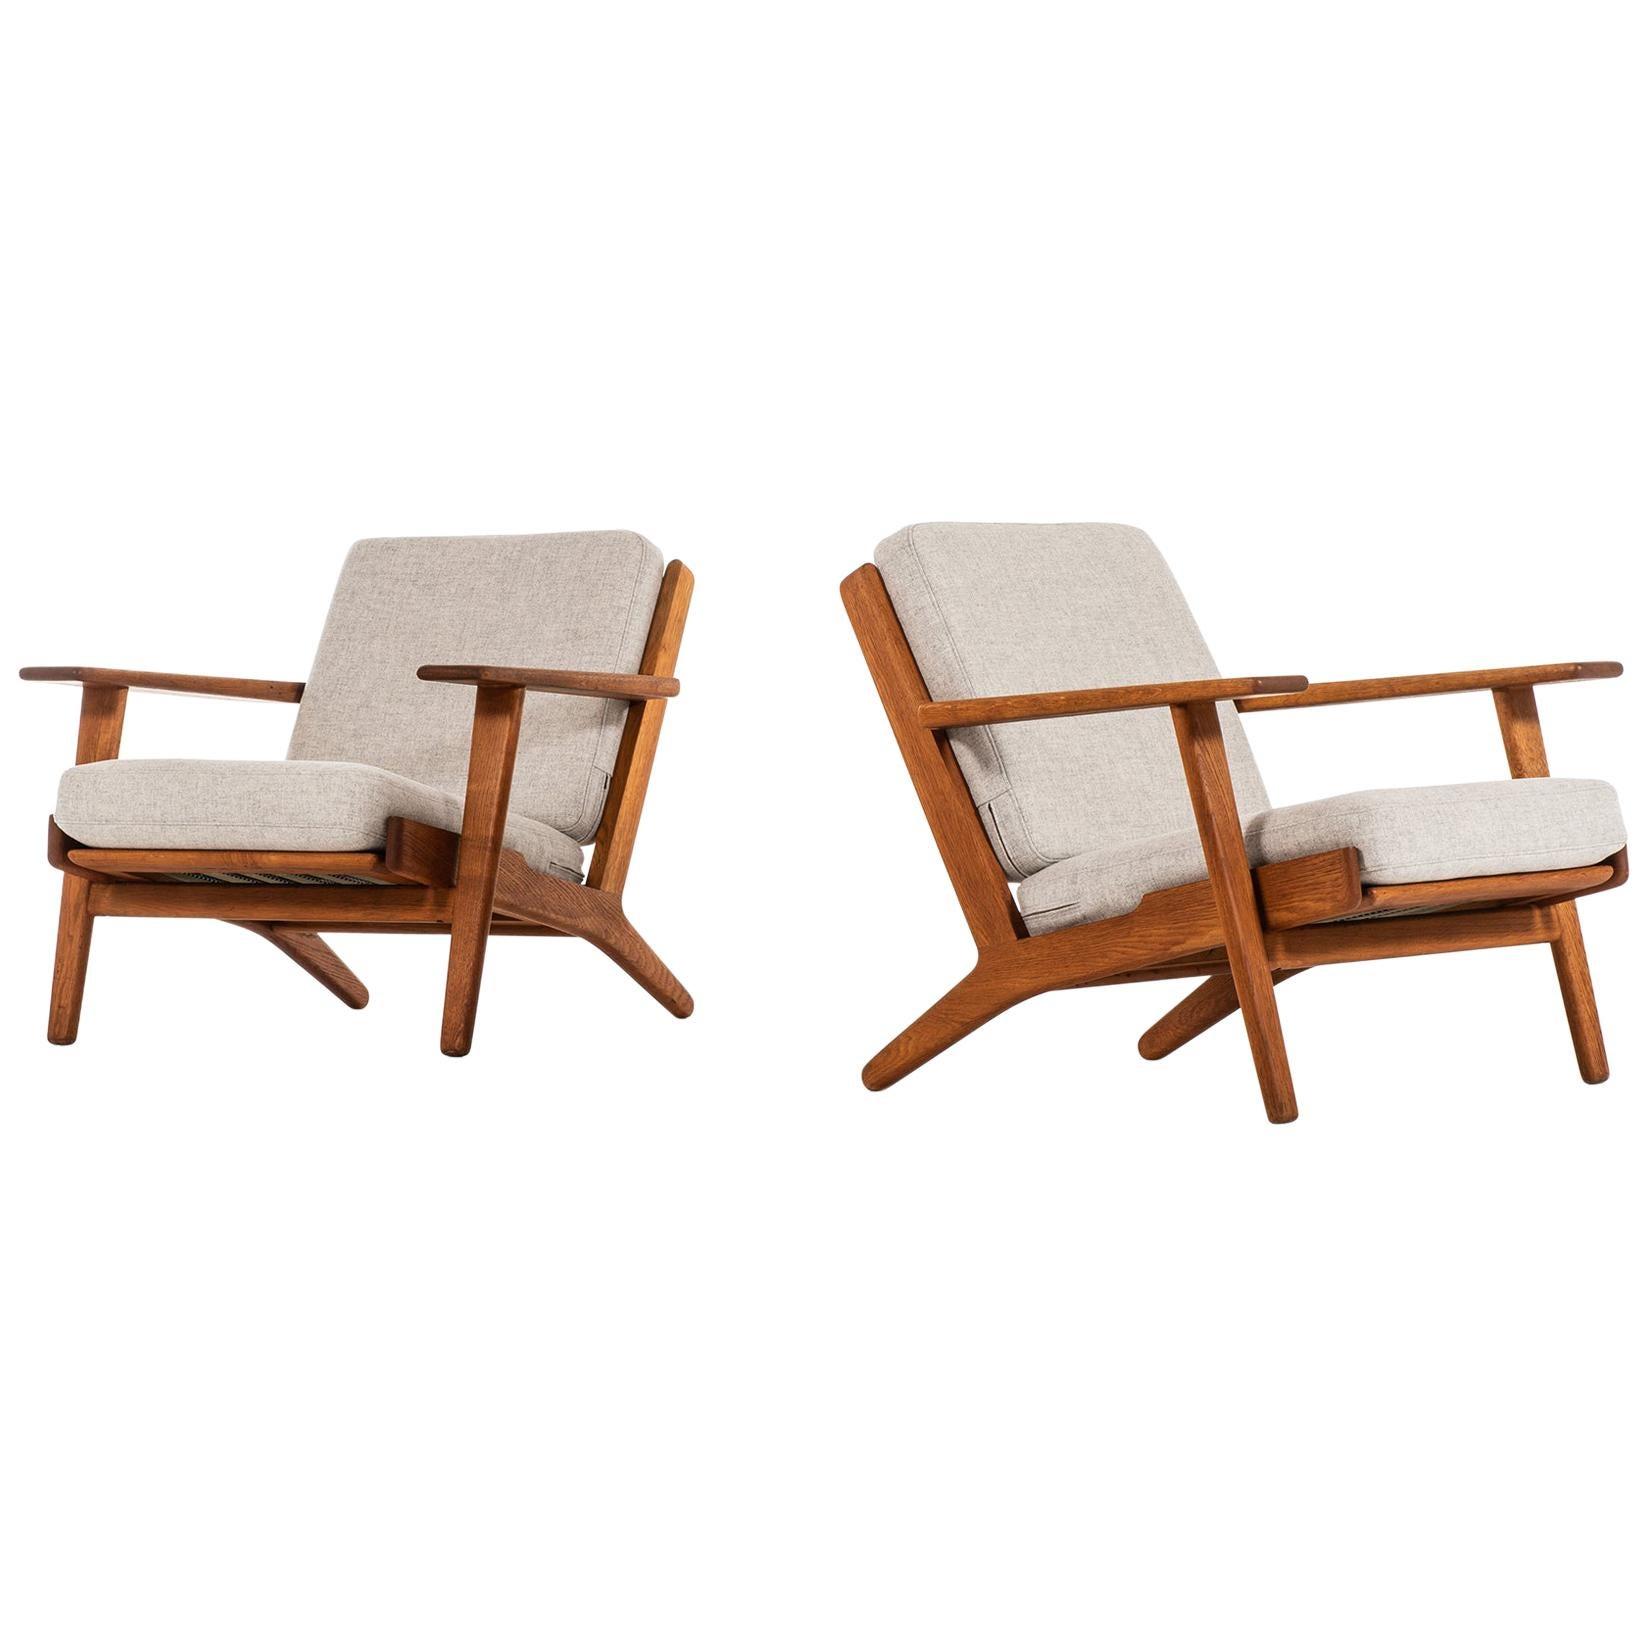 Hans Wegner Easy Chairs Model GE-290 Produced by GETAMA in Denmark